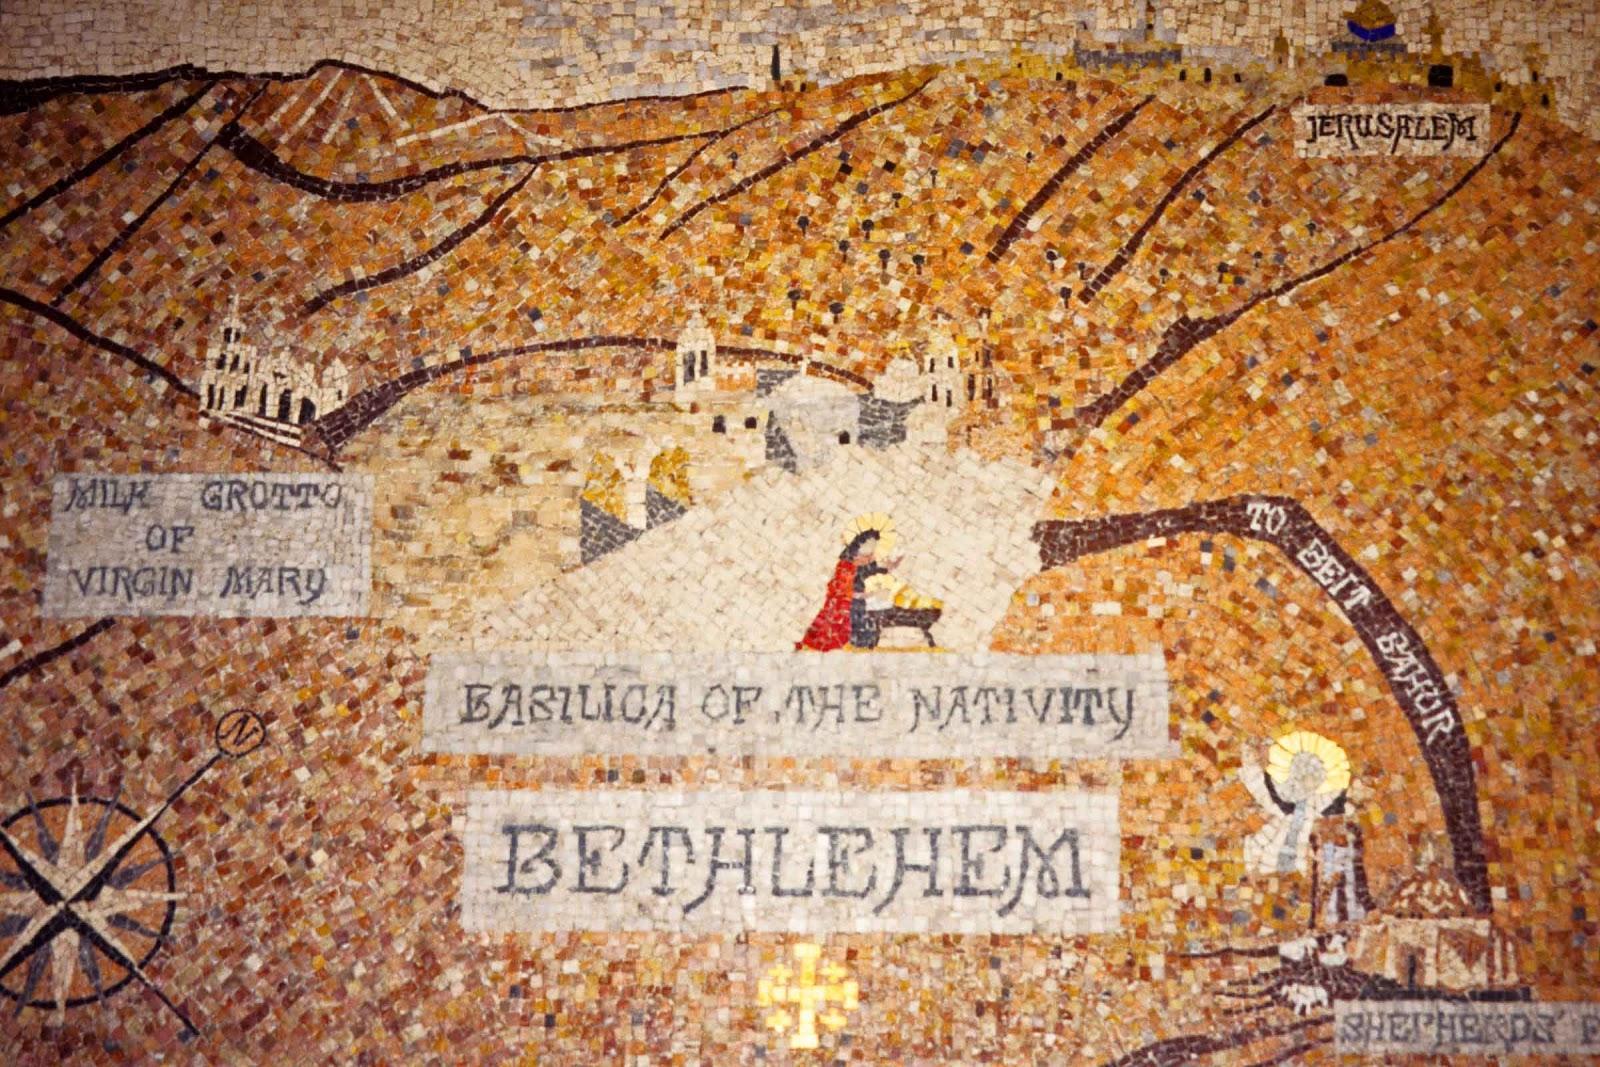 Bethlehem Palestinian  city images : Bethlehem, Palestinian Territories